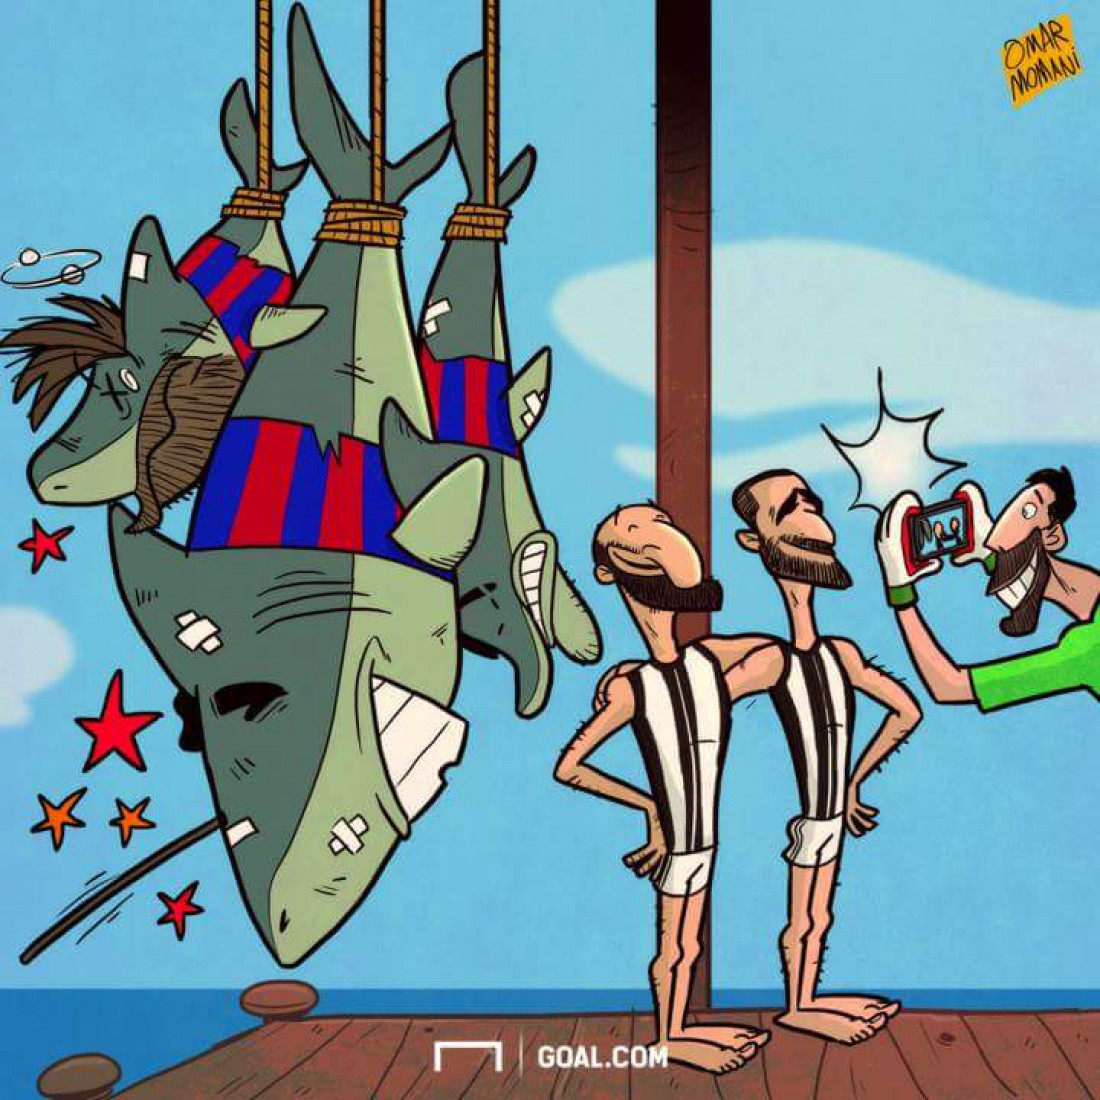 Карикатура на победу Ювентуса над Барселоной